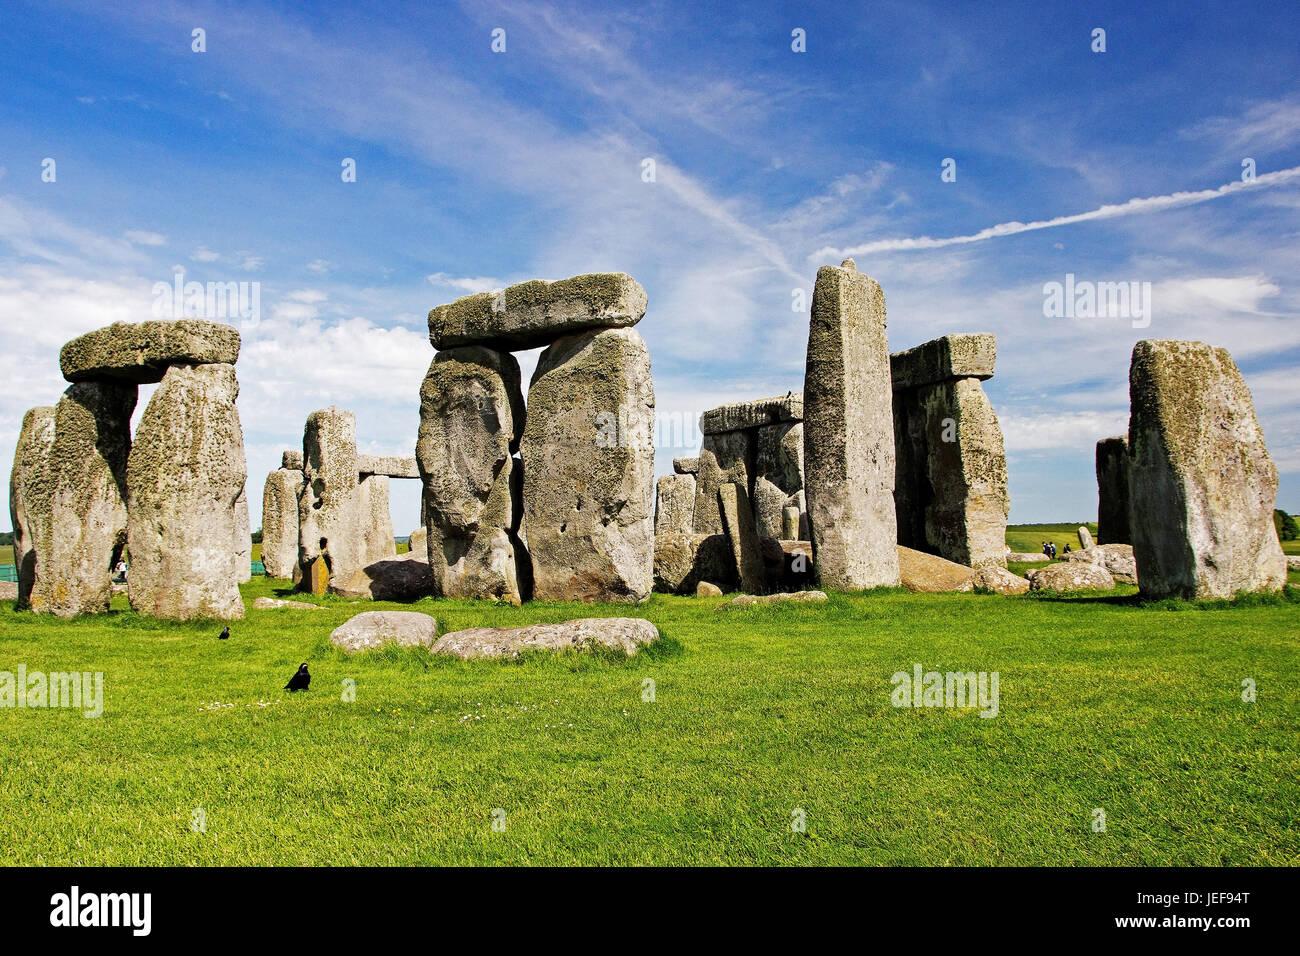 Stonehenge, Wiltshire, Gran Bretagna, Grossbritannien Foto Stock